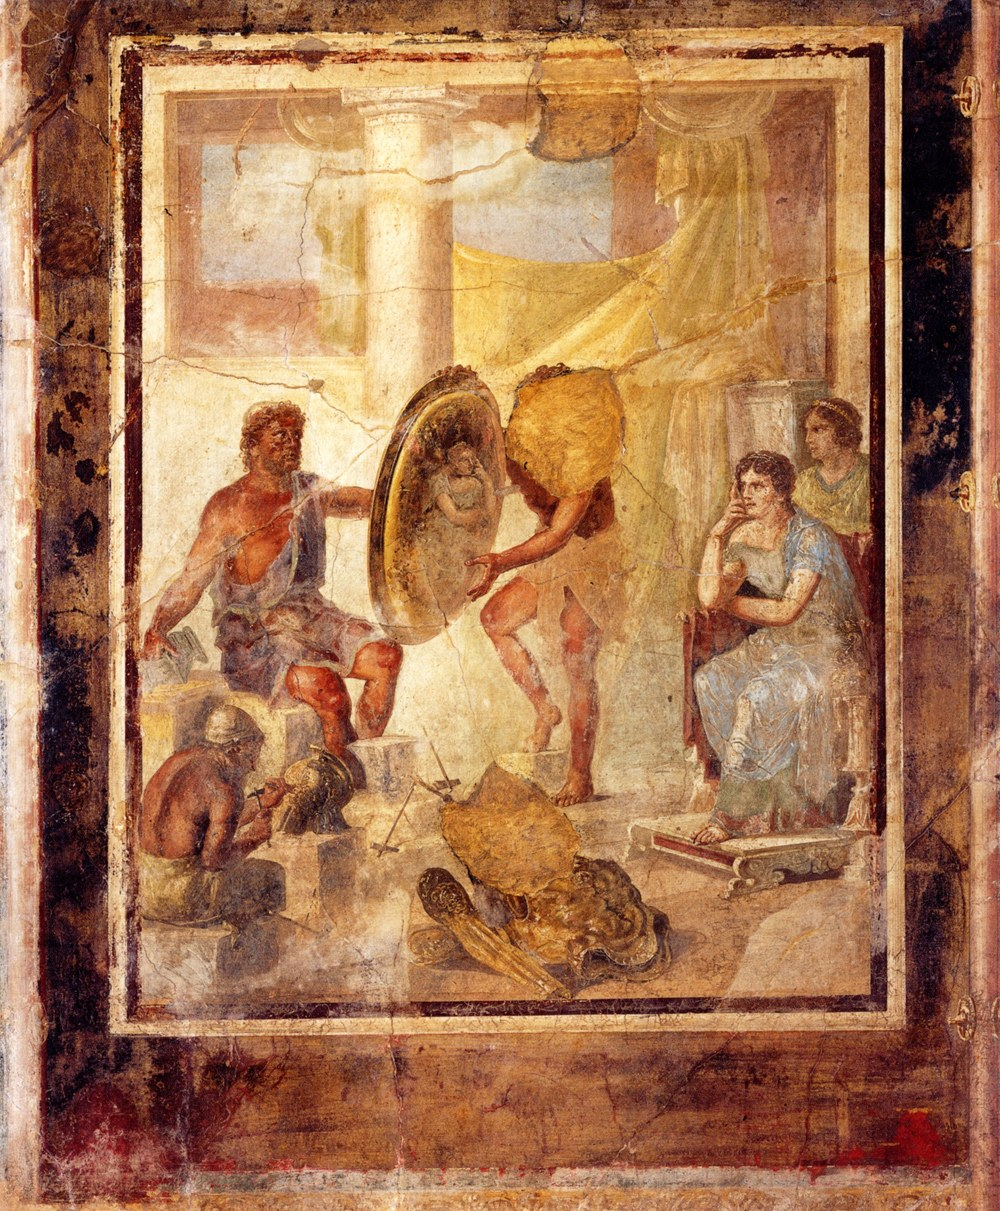 Wall painting from the Casa di Paccius Alexander (Pompeii IX.1.7 = Museo Archeologico Nazionale di Napoli inv. 110338), first century AD. (Reproduced by kind permission of the Institut für Klassische Archäologie und Museum für Abgüsse Klassischer Bildwerke, Ludwig-Maximilians-Universität, Munich)